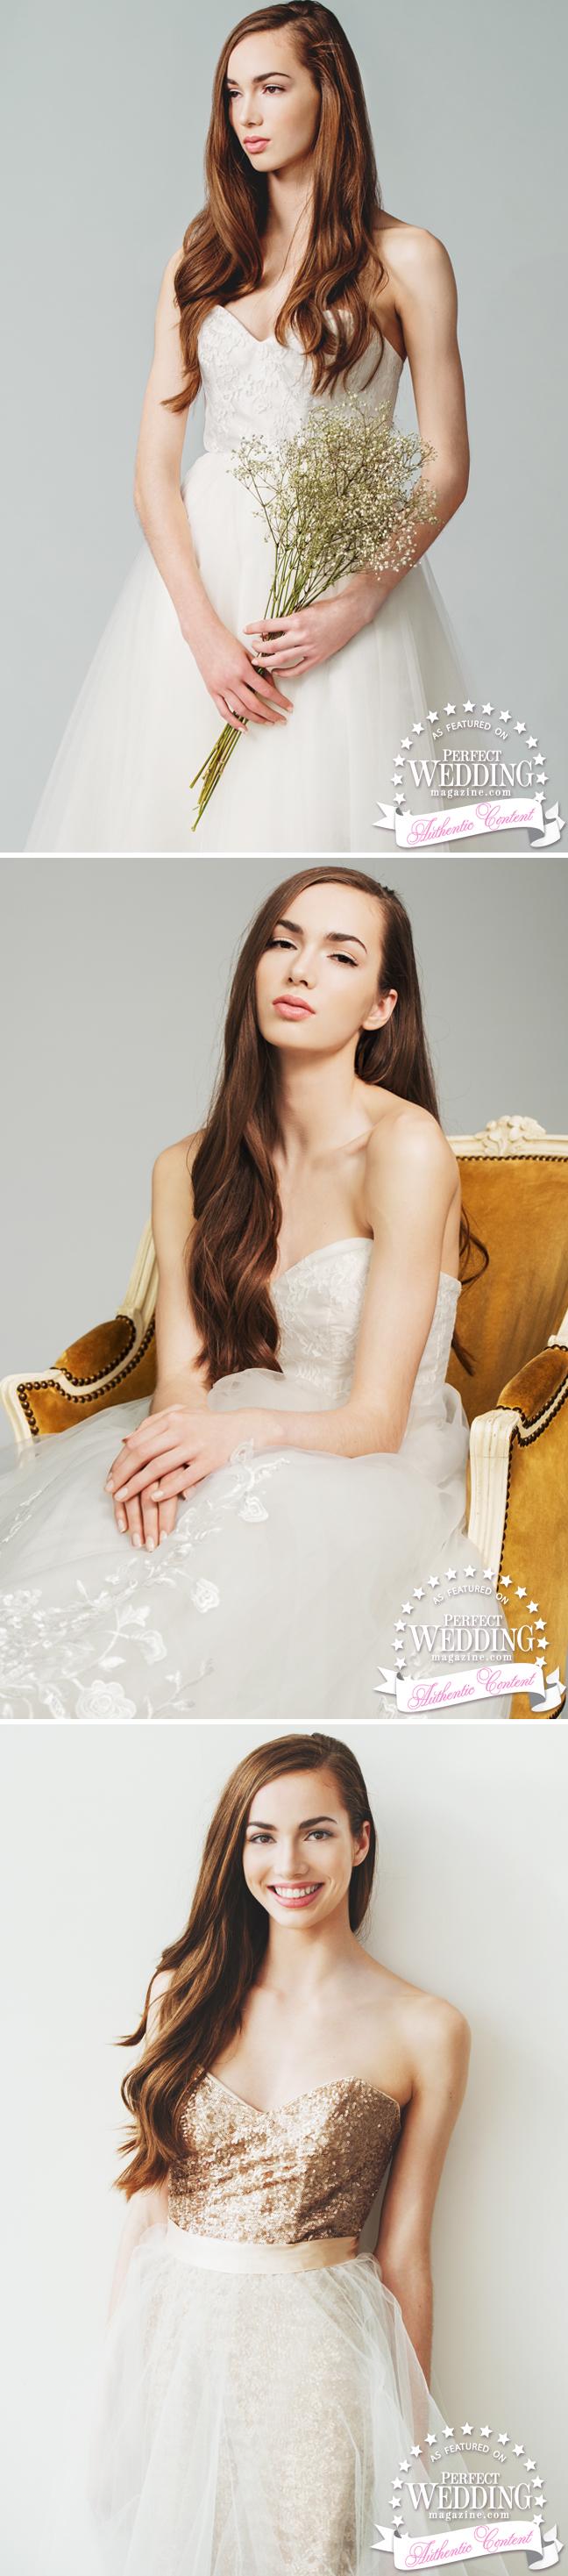 Fresh Beauty, Pure Magnolia, Perfect Wedding Magazine, Perfect Wedding Magazine Blog, Bridal Fashion, Paul Behm Photography